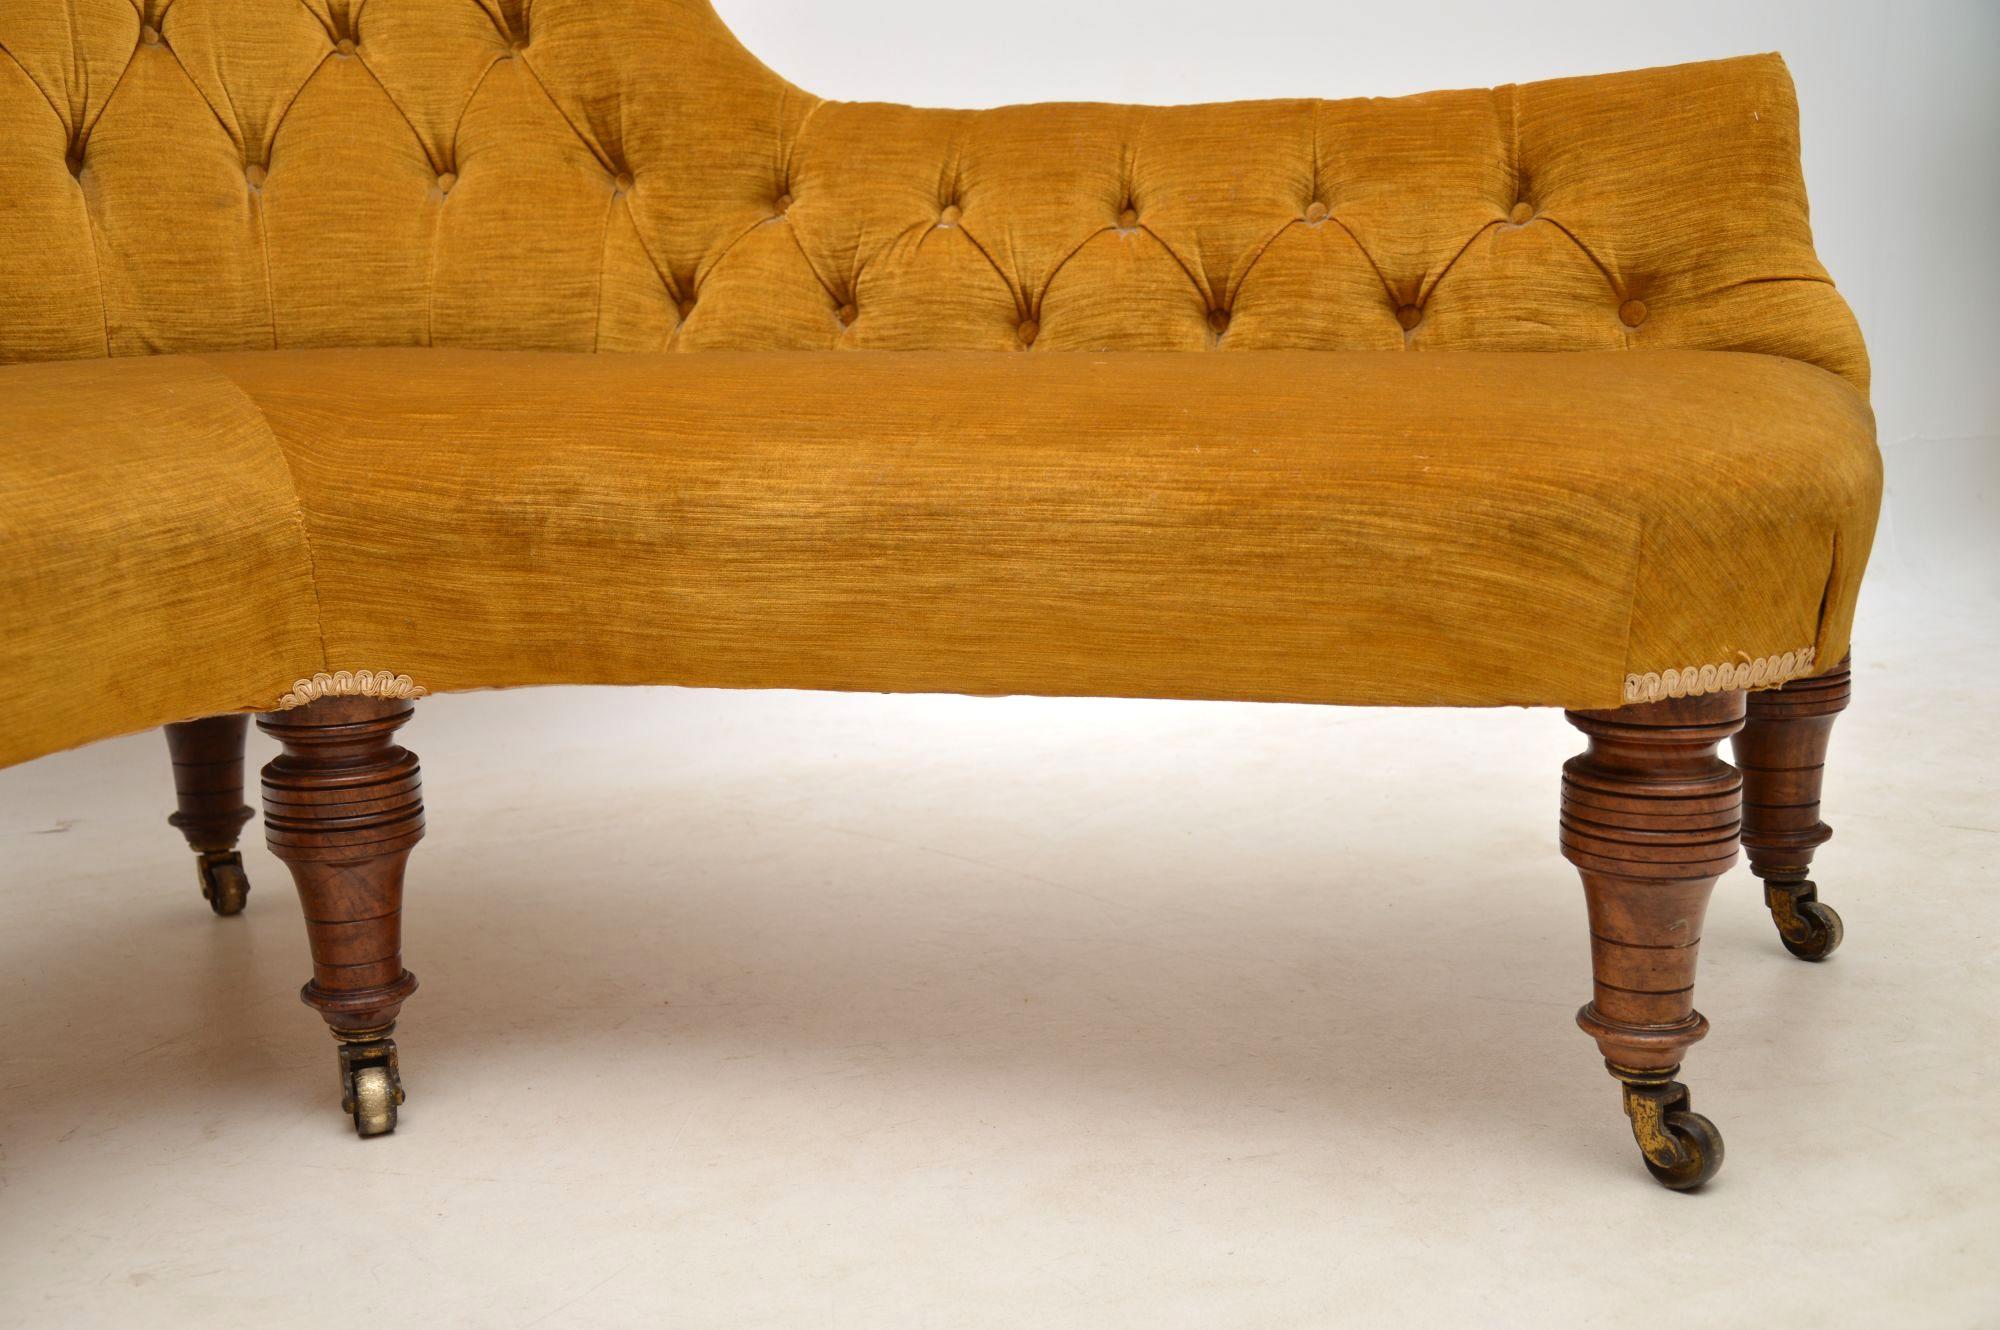 Antique Victorian Corner Sofa Chaise Lounge Interior